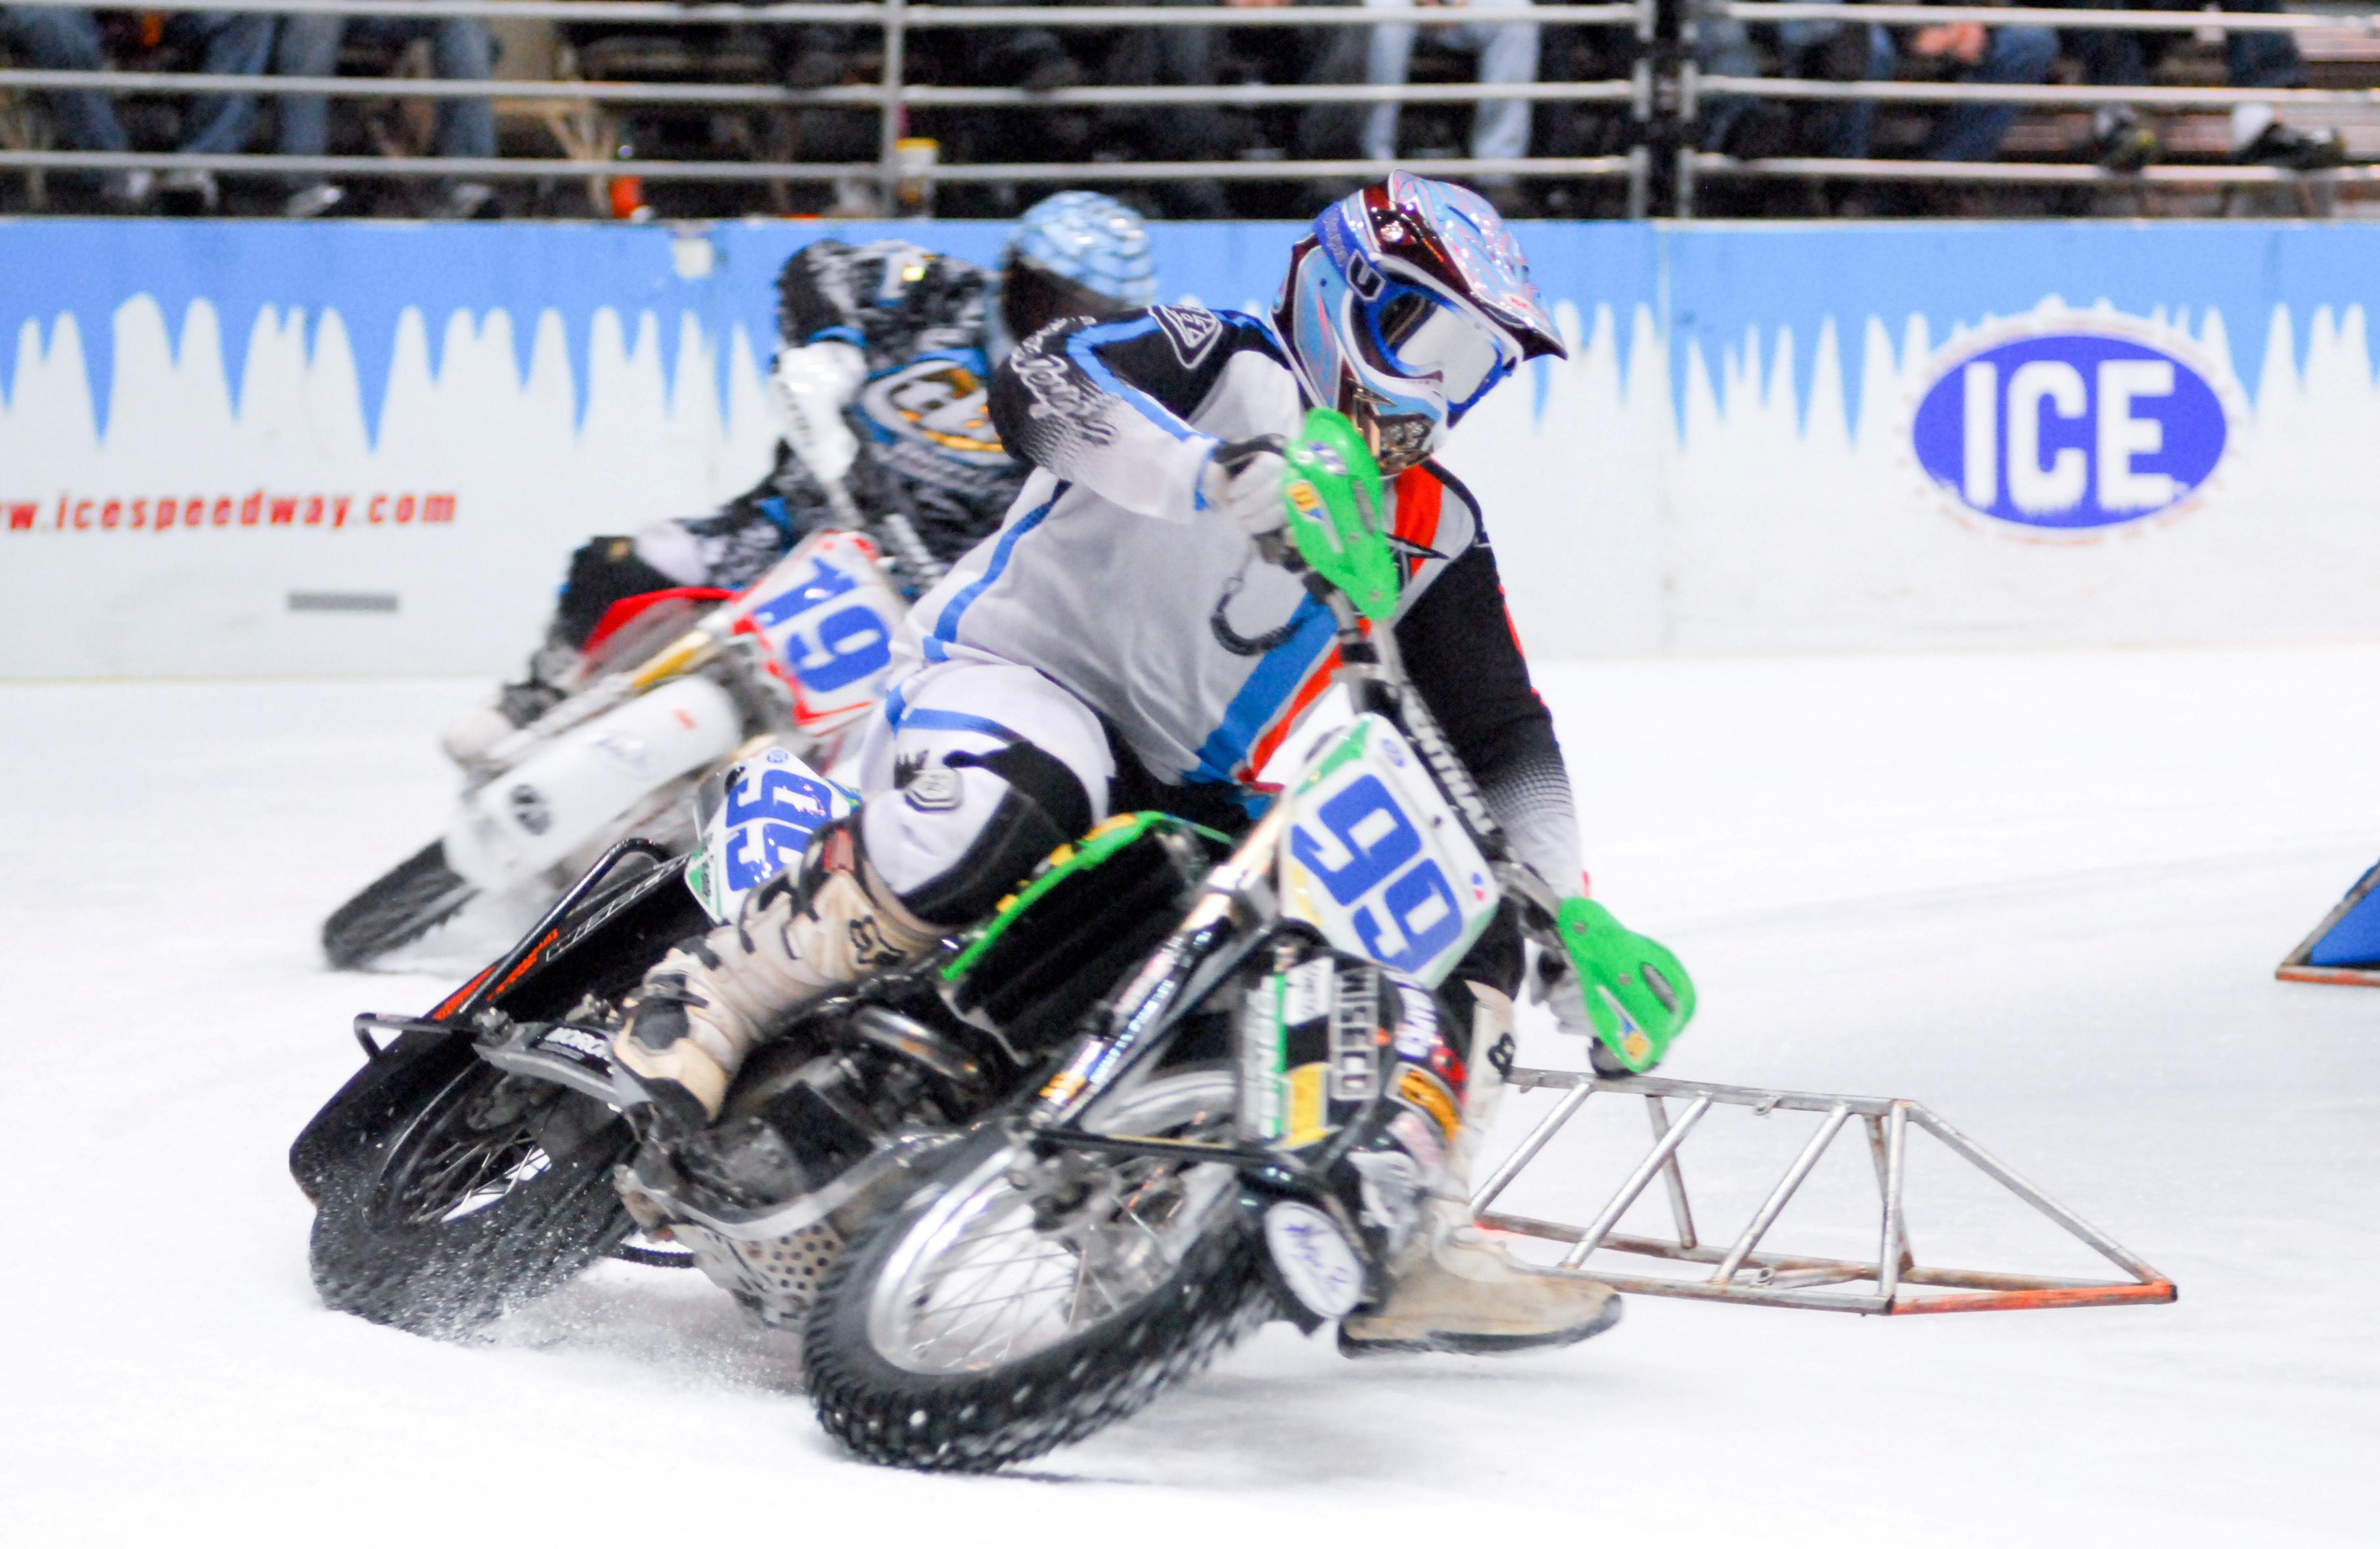 World Championship Ice Racing Hampton Coliseum